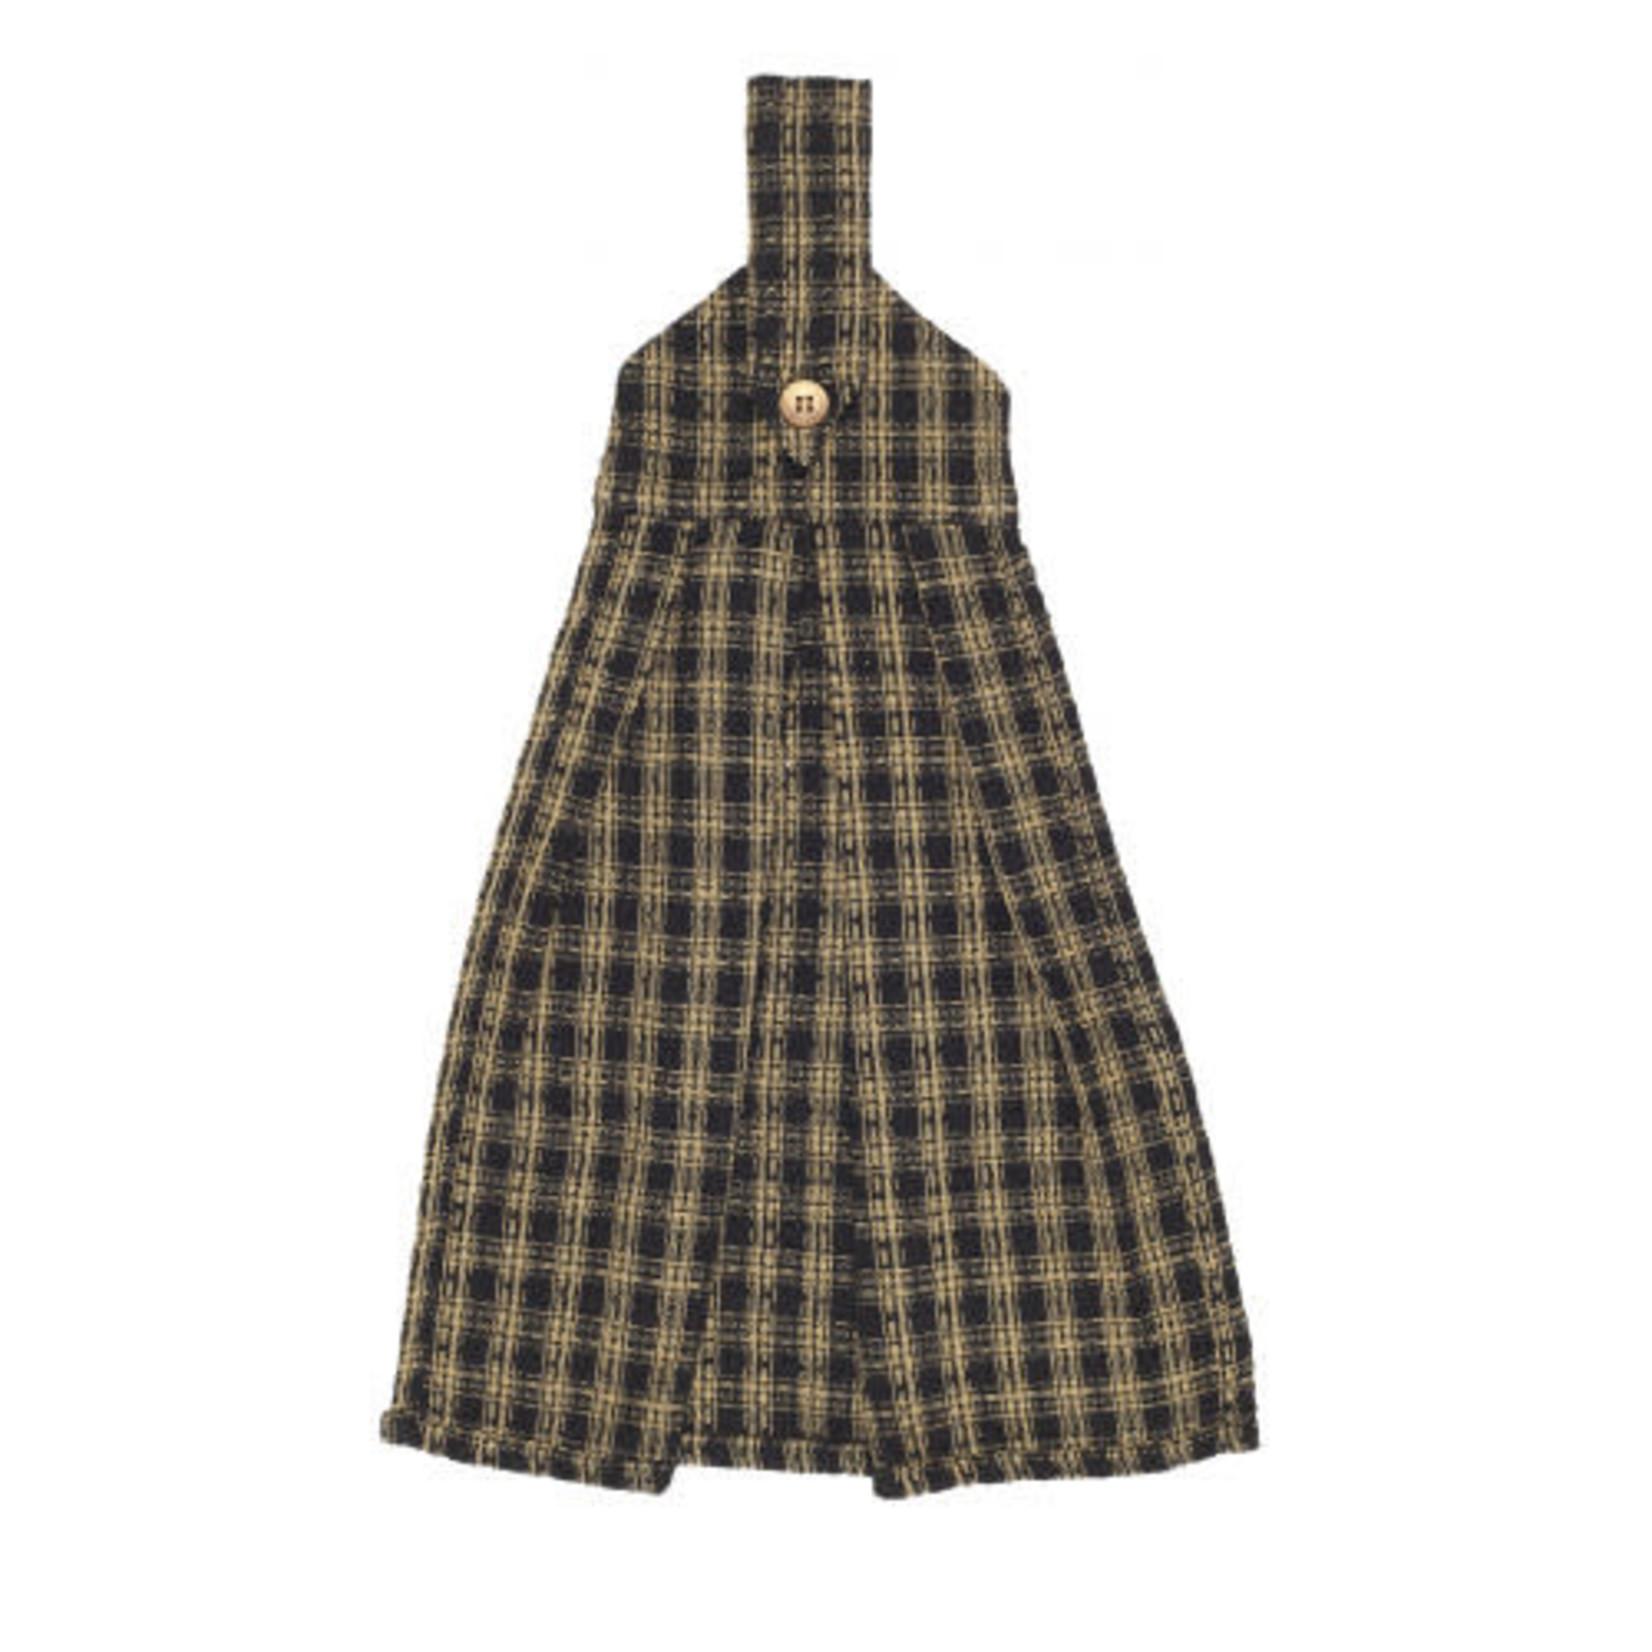 AP - Hanging Tie Button Towel